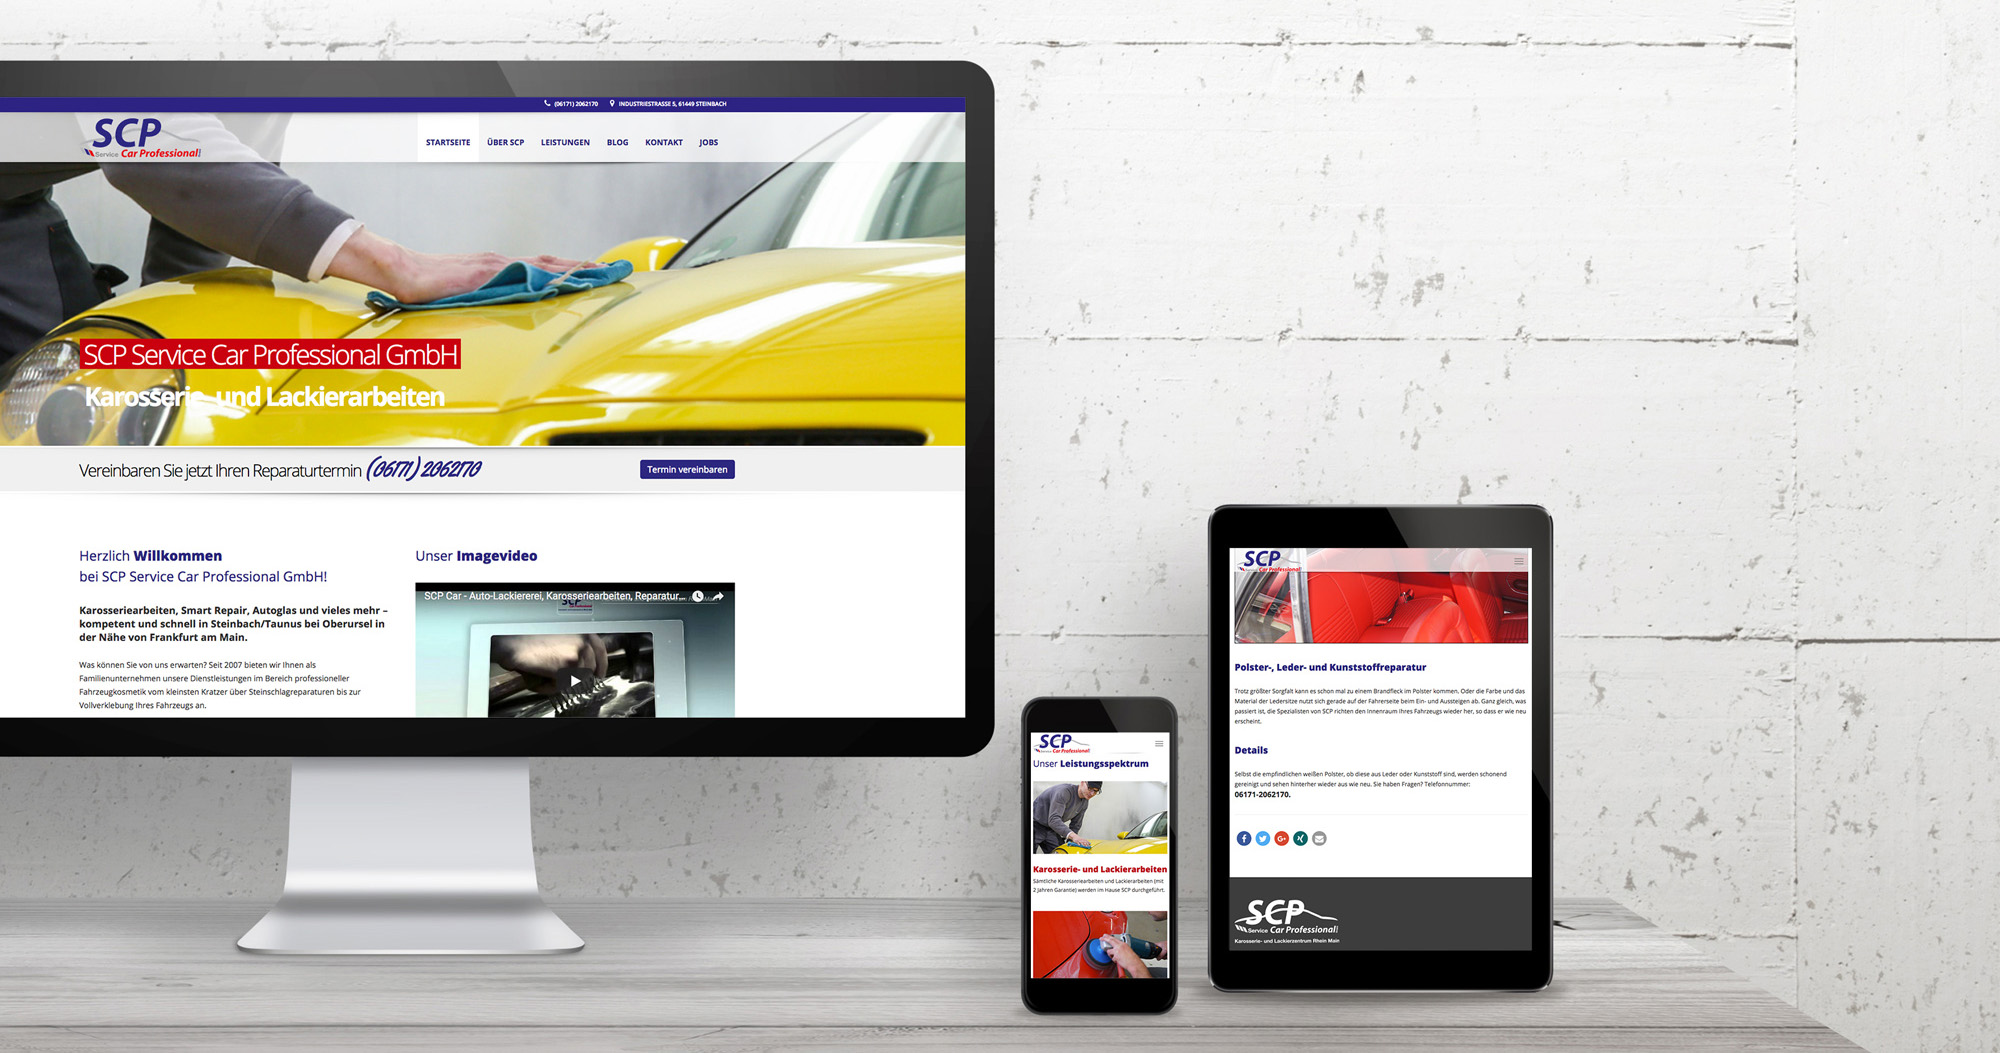 SCP Service Car Professional GmbH nachher